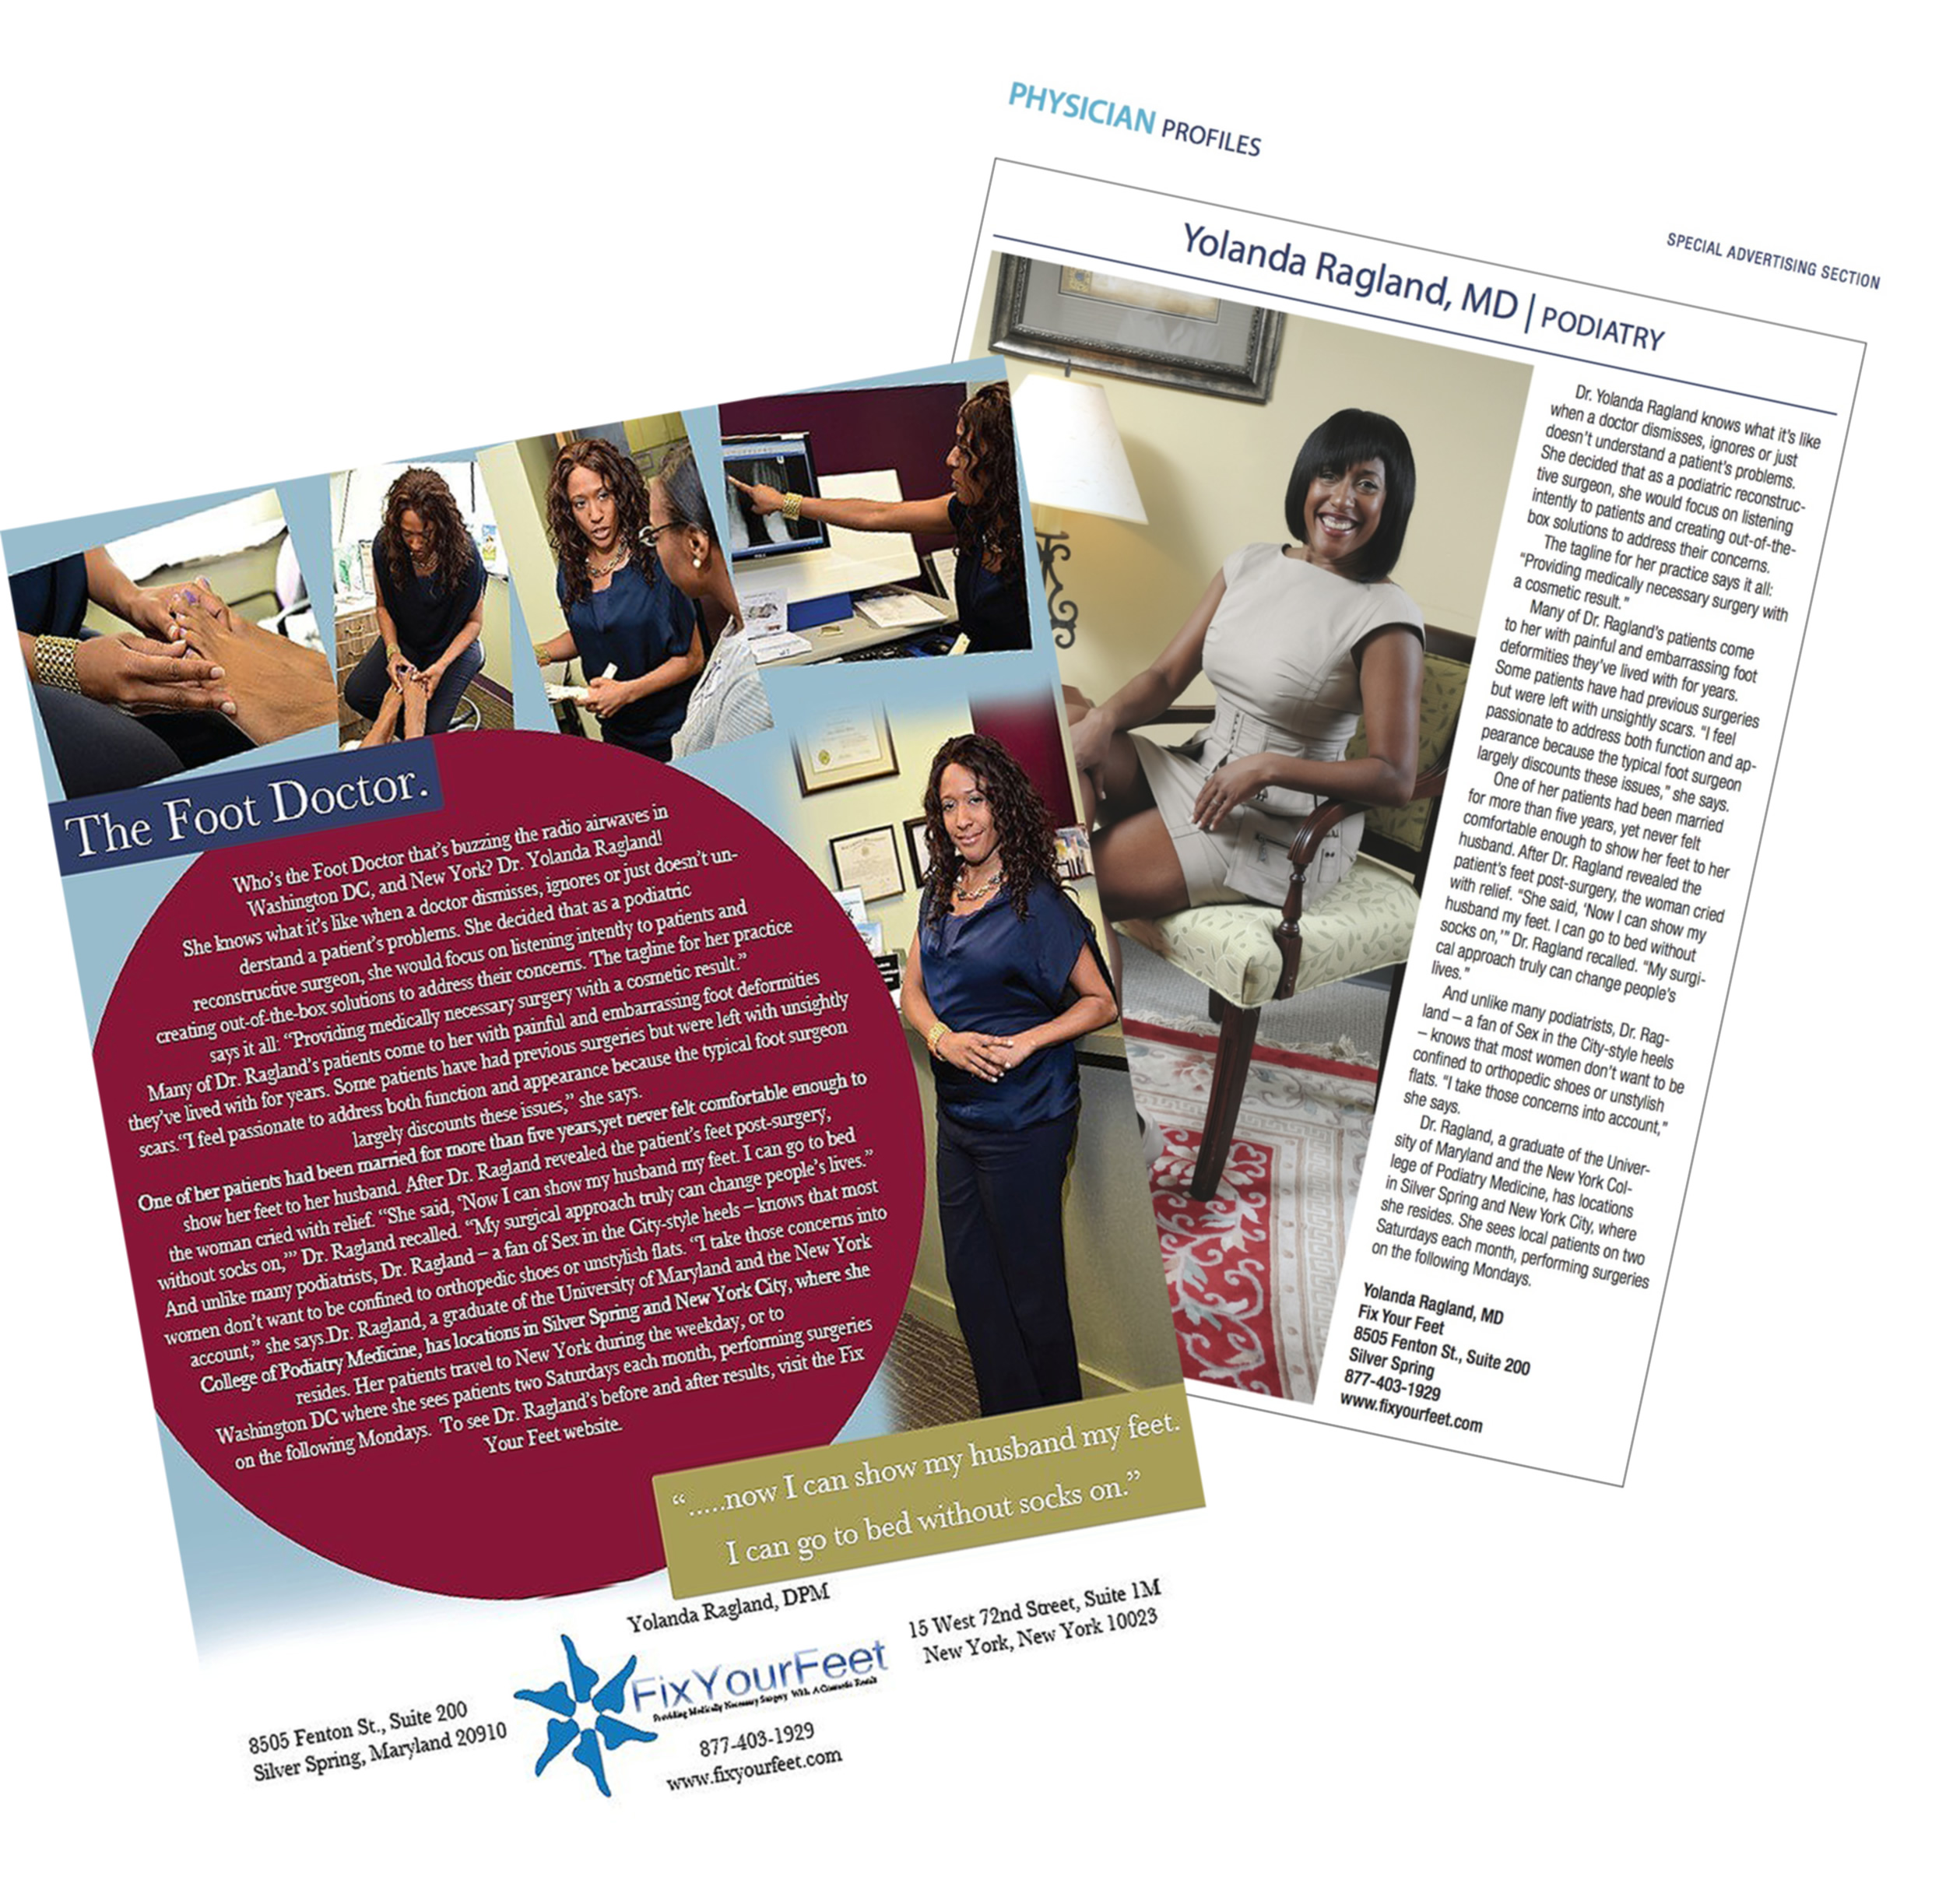 social media marketing case studies 2012